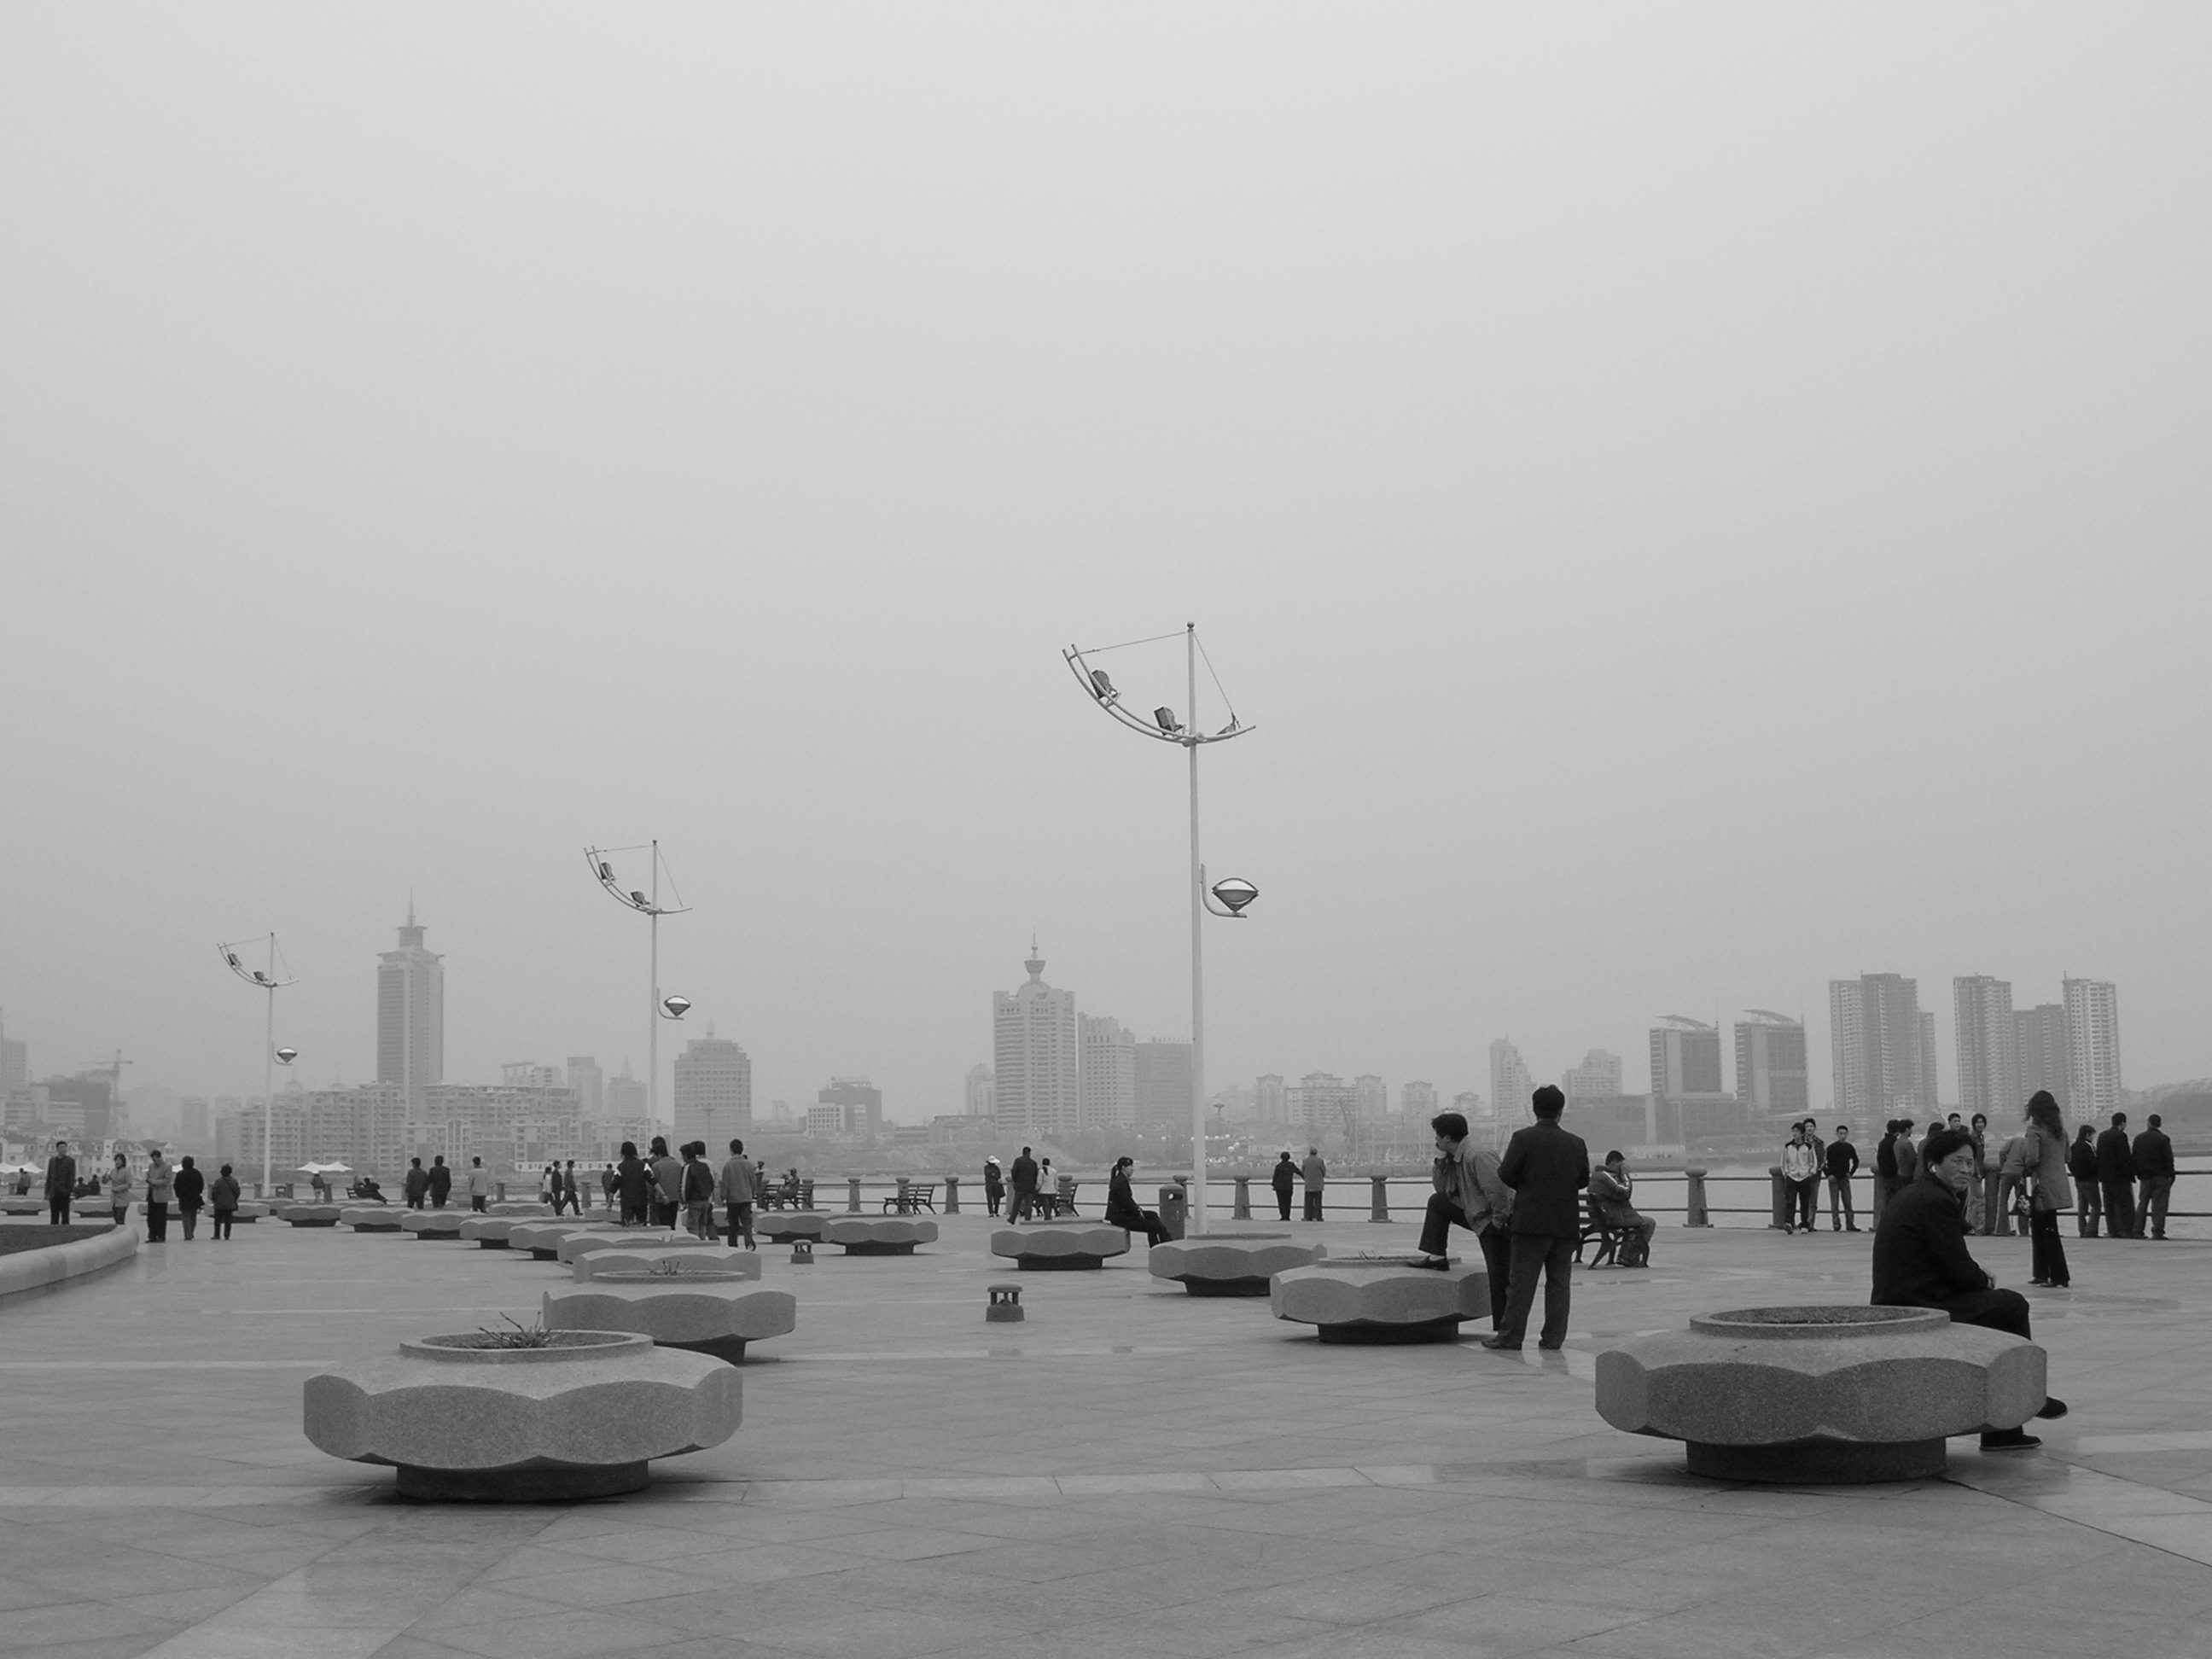 qingdao wusi square